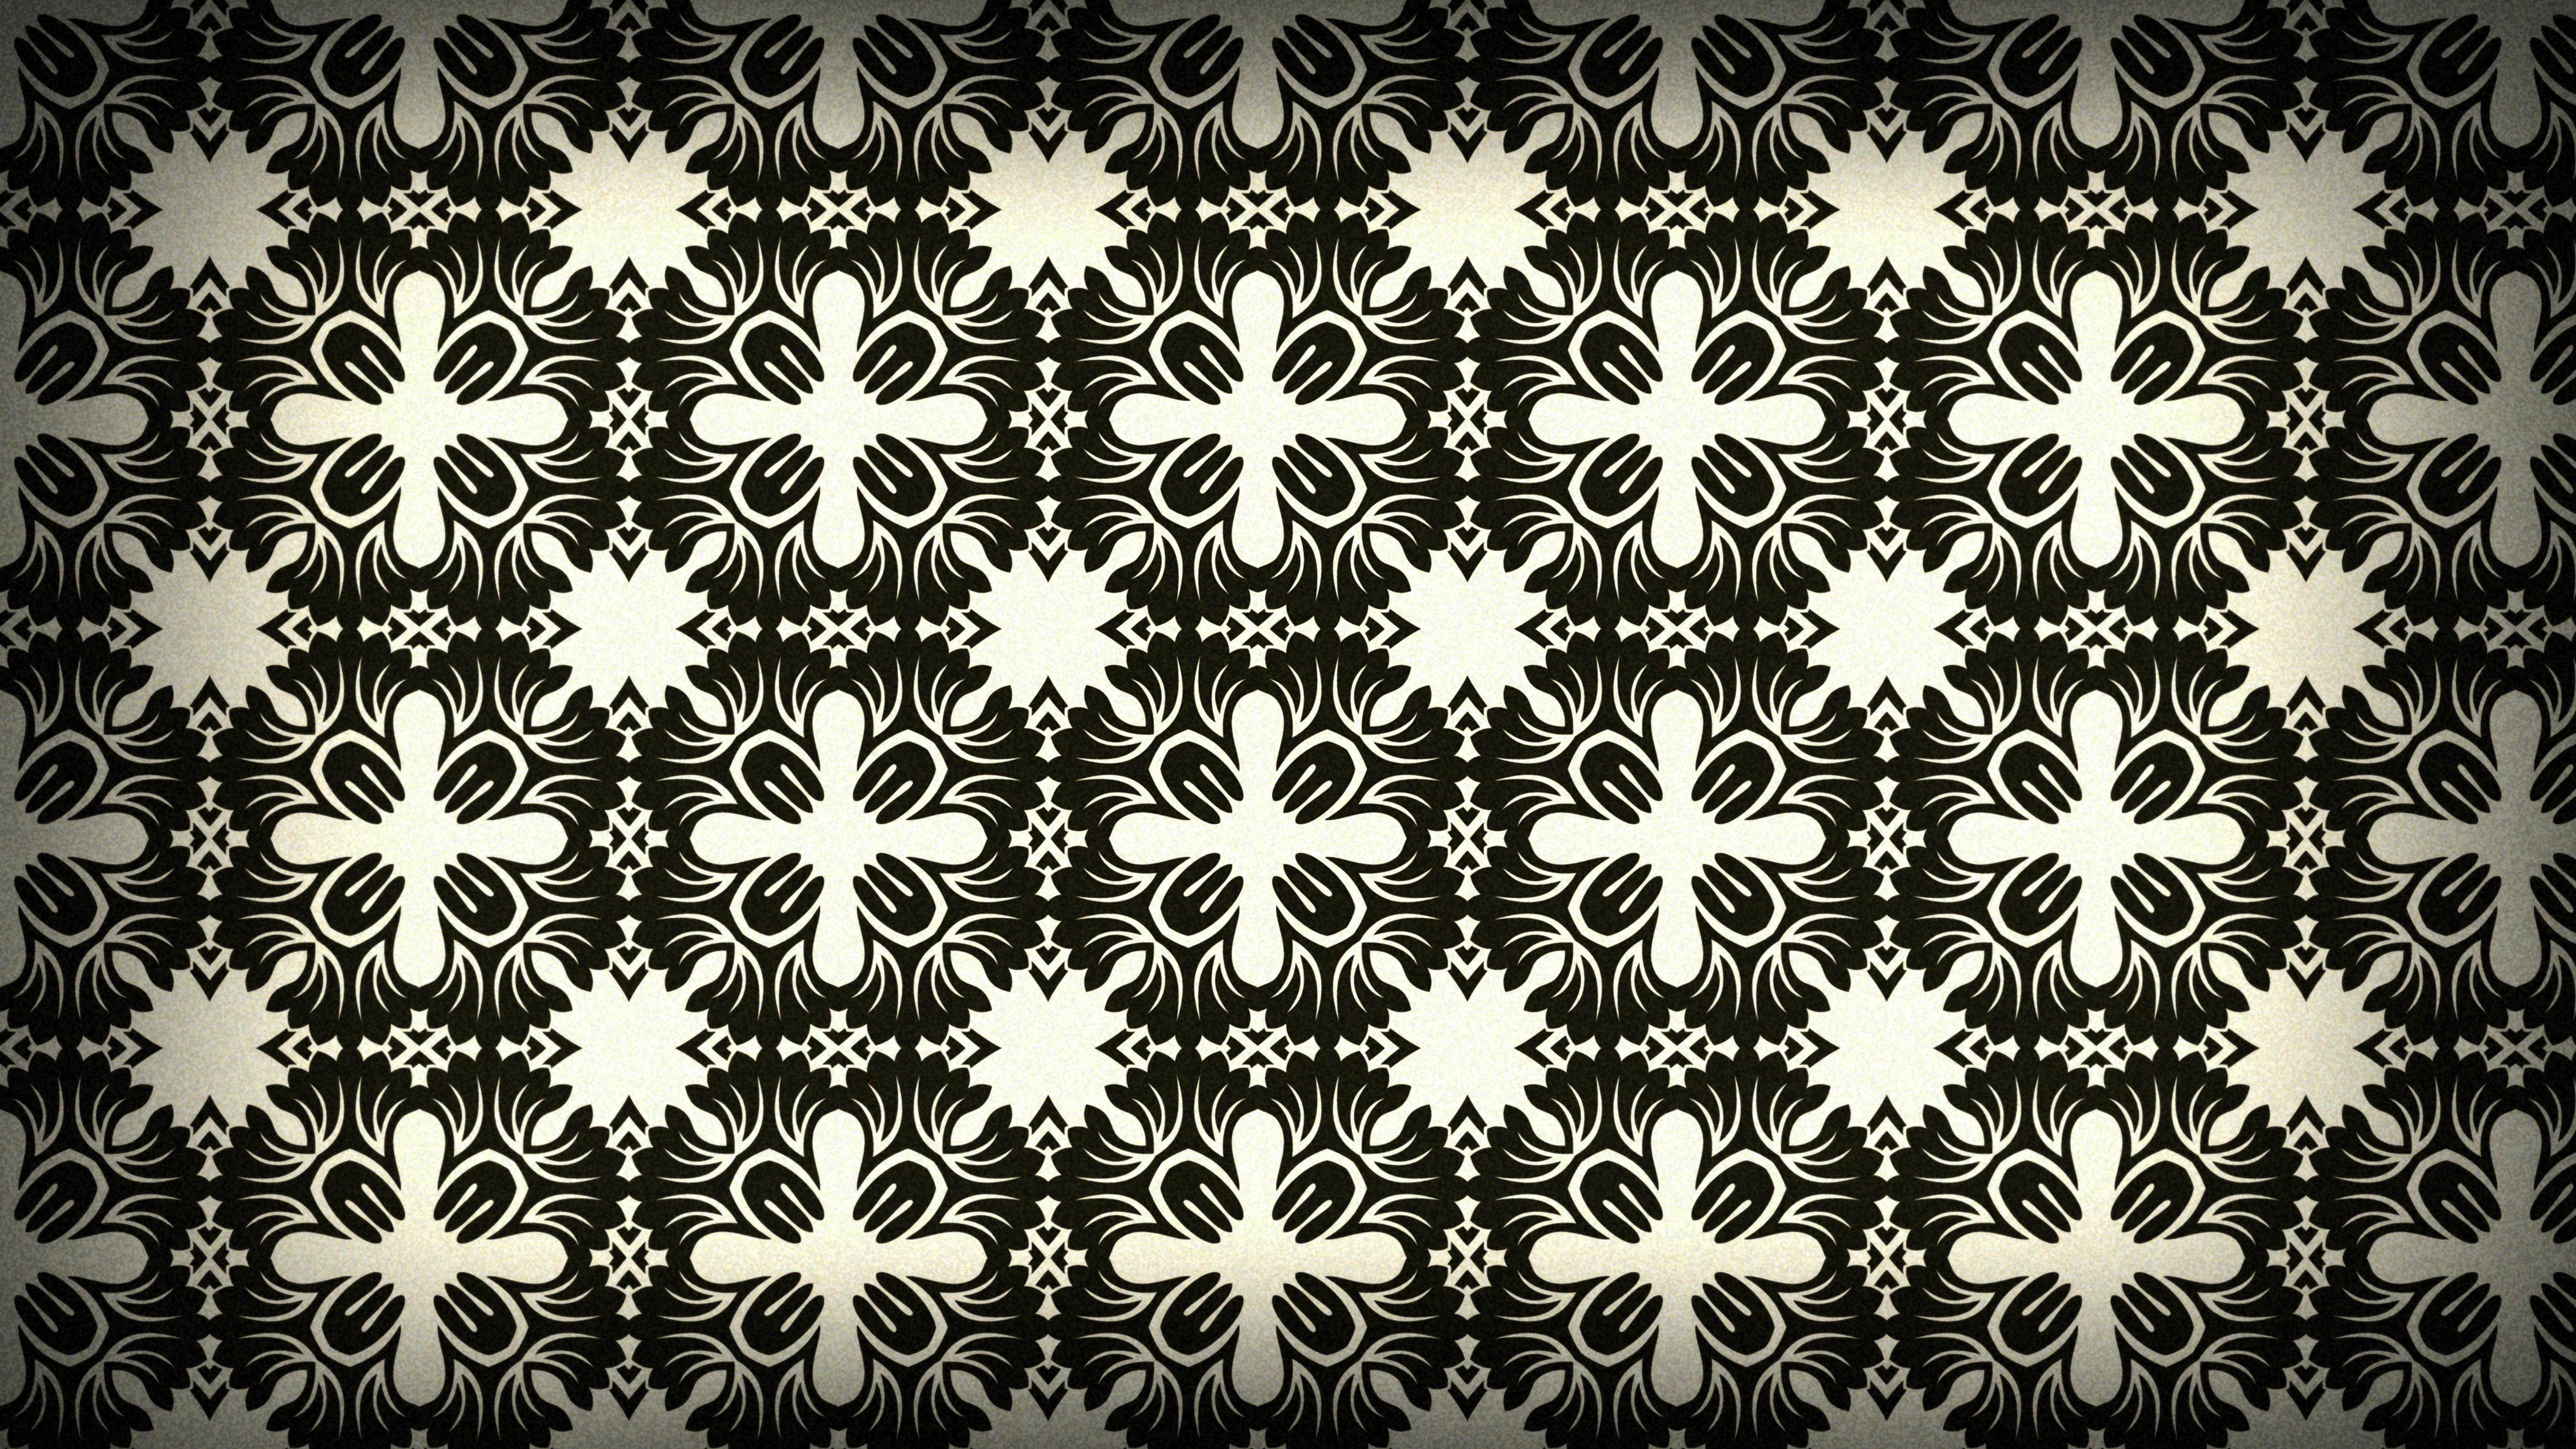 Dark Brown Vintage Seamless Wallpaper Pattern Template